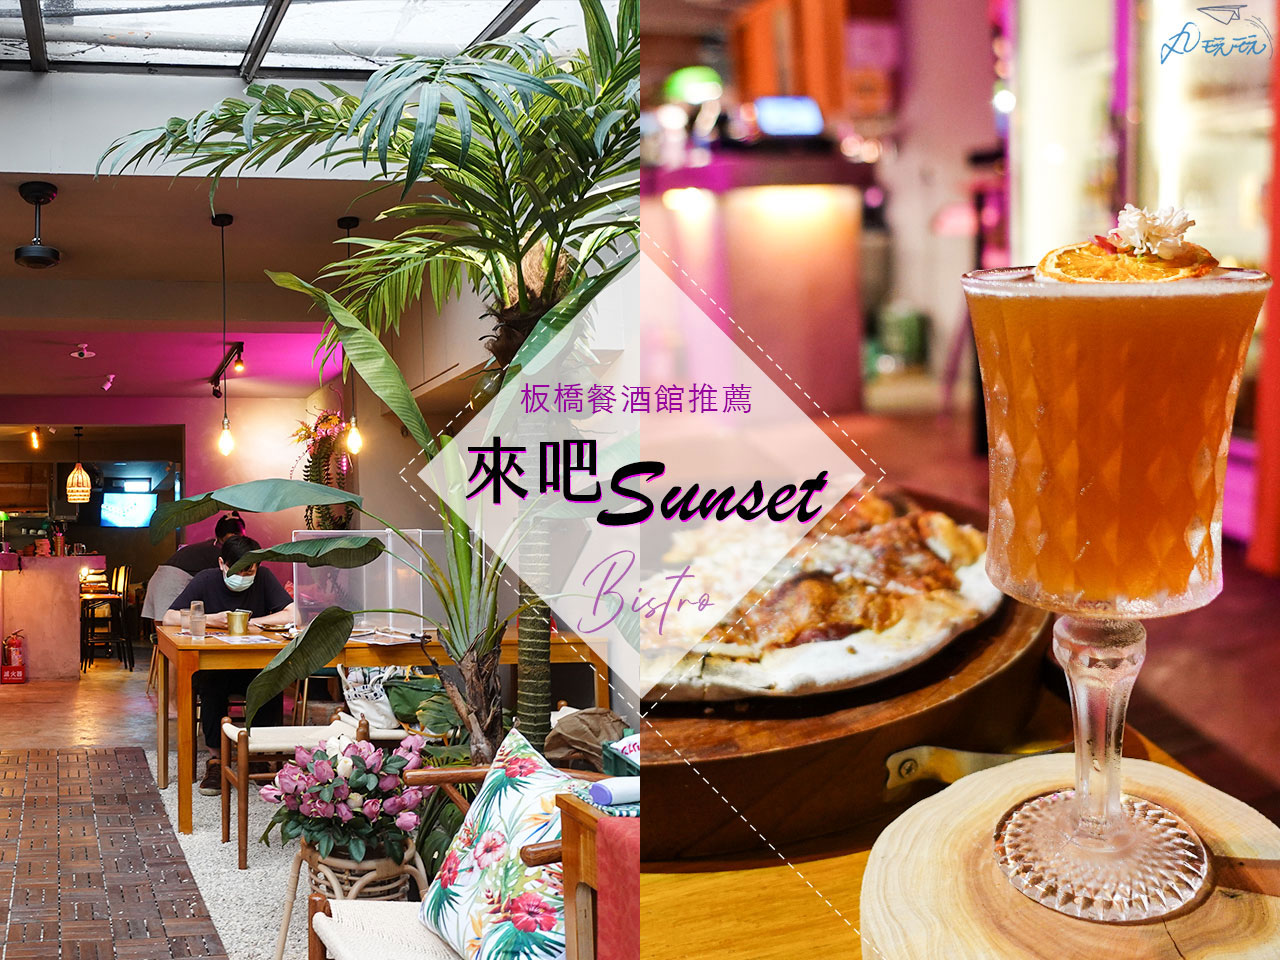 Read more about the article 板橋餐酒館|來吧Sunset 都市裡的南洋風酒吧,放鬆喝酒、聊天聚會超適合